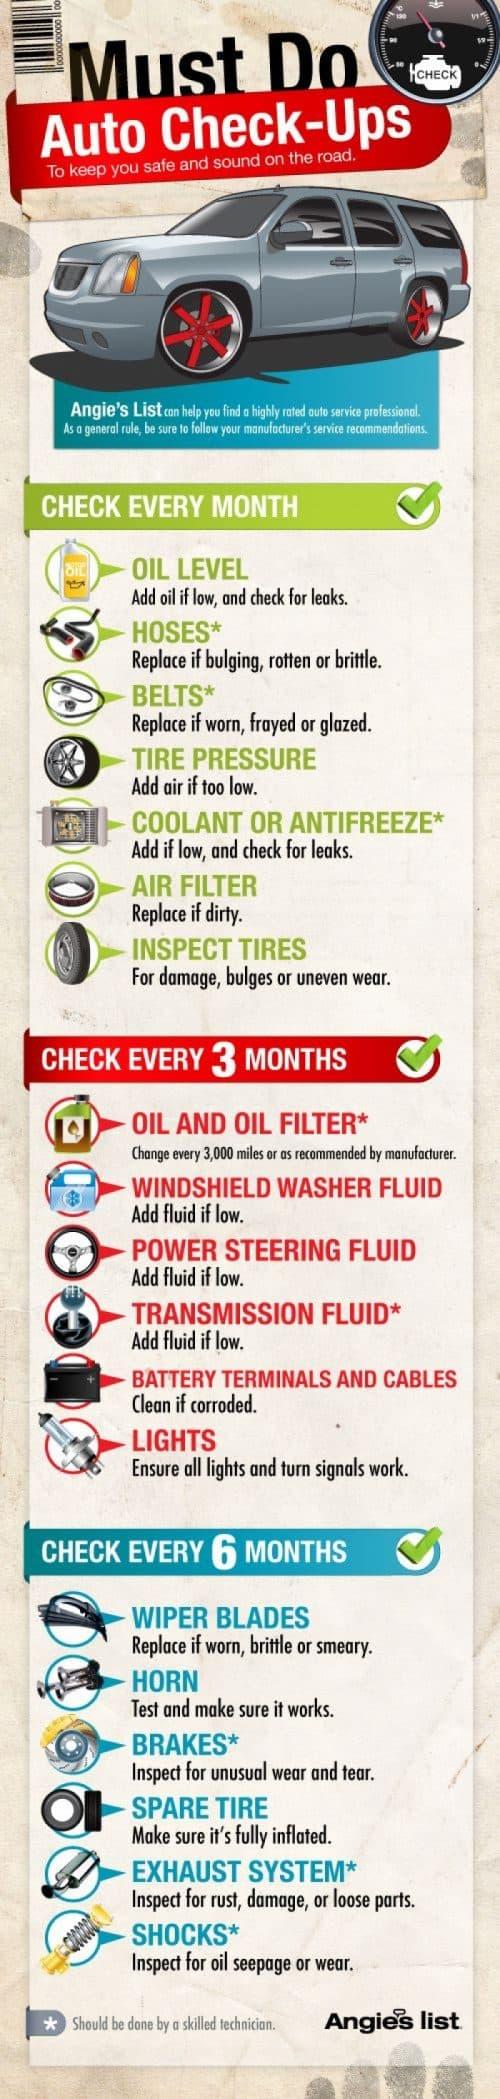 angies-list-car-checklist